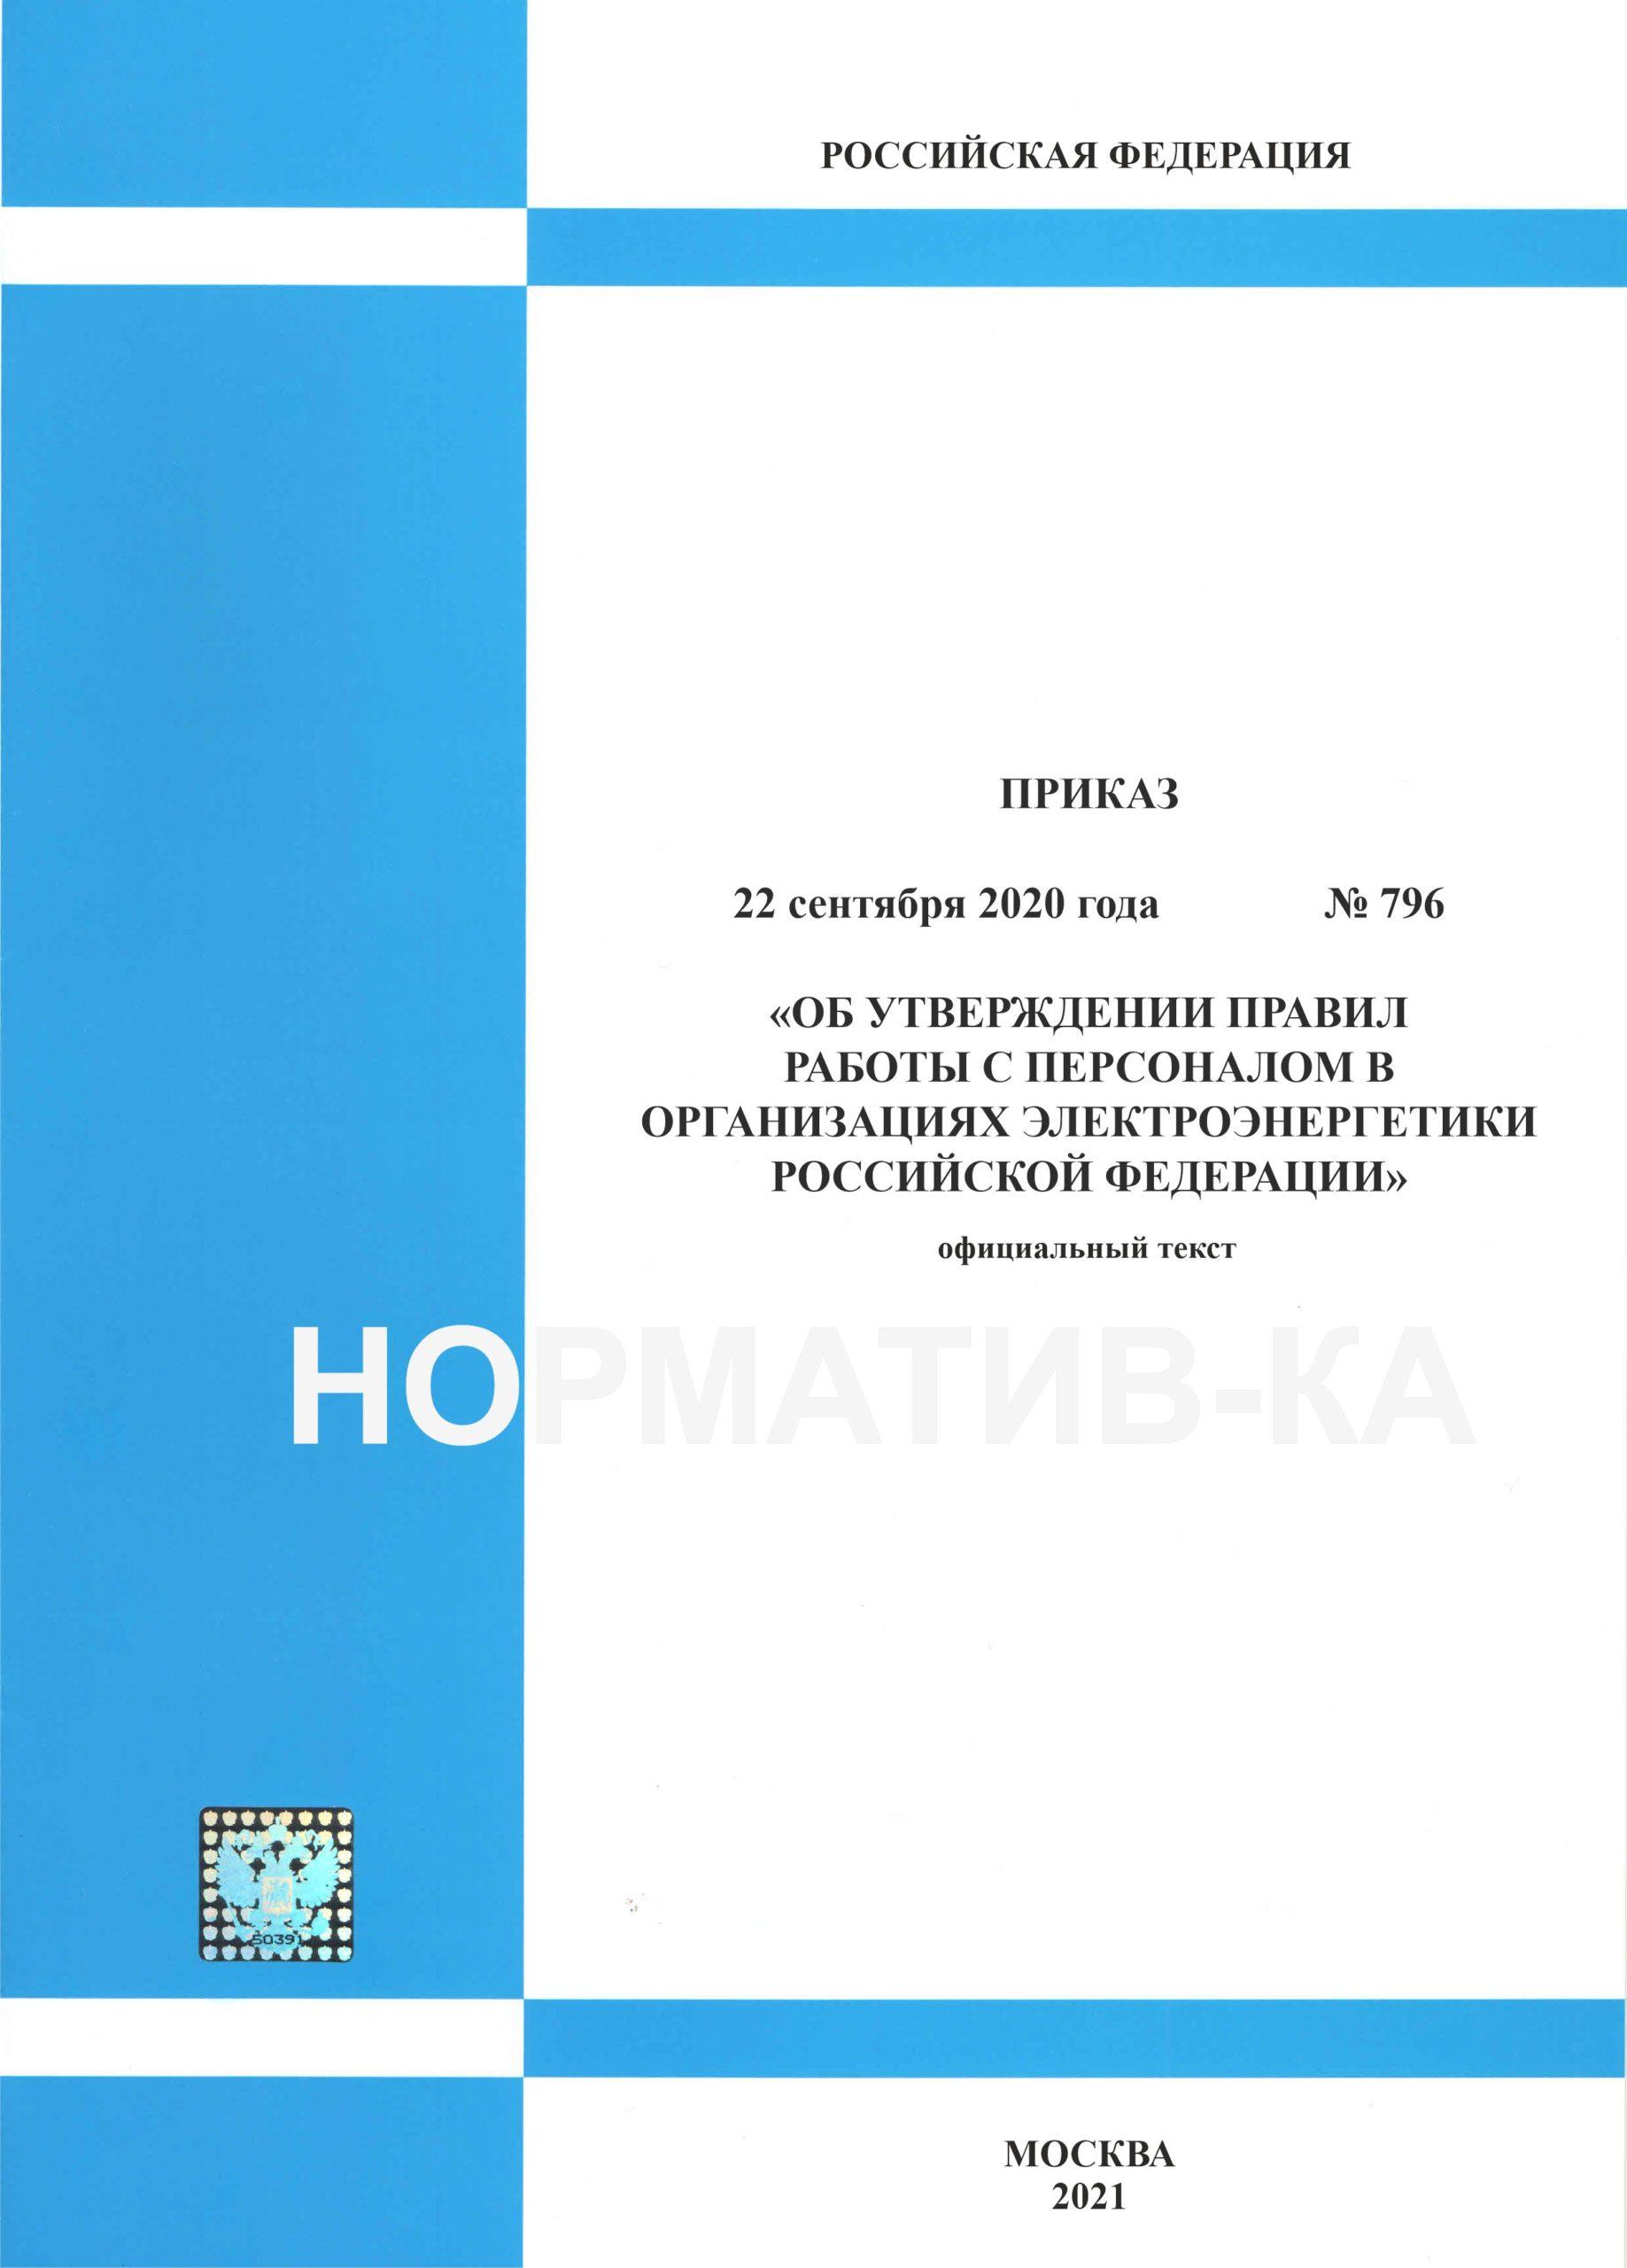 Приказ № 796